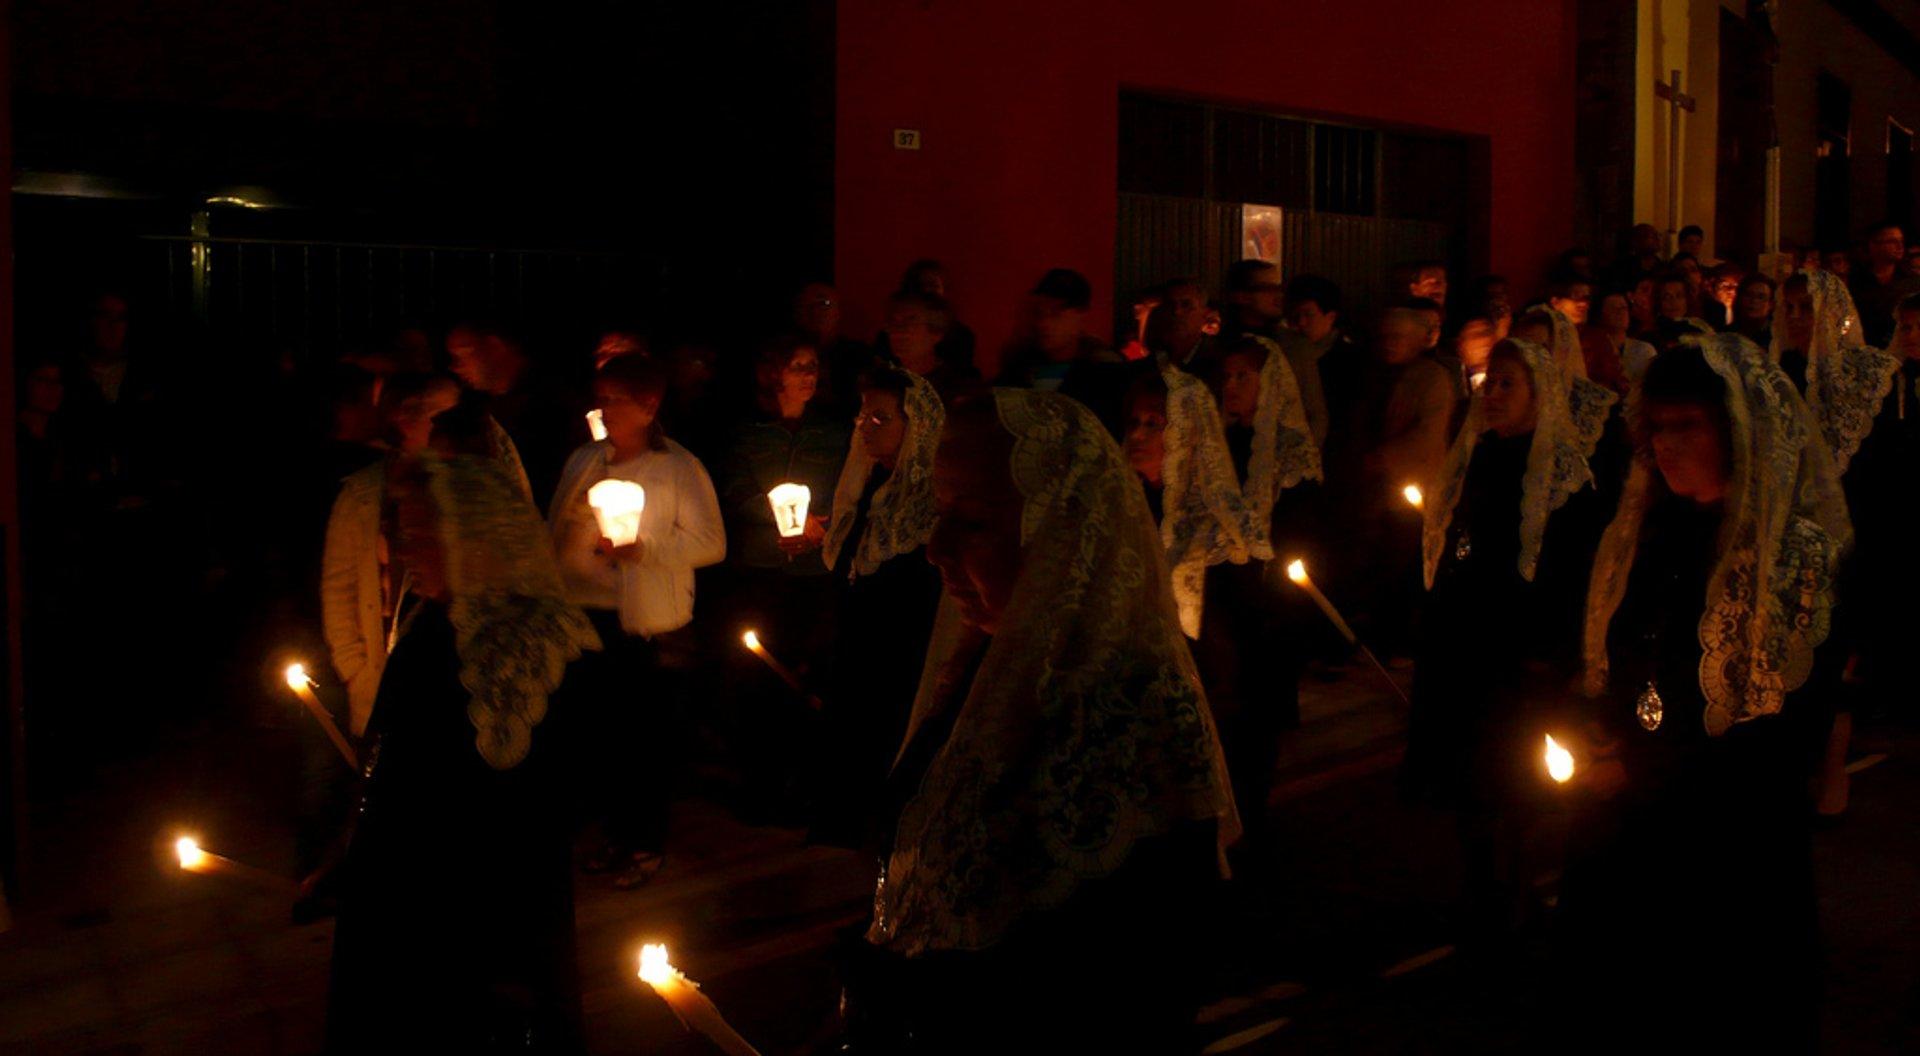 Semana Santa or Easter Holy Week in Canary Islands - Best Season 2020